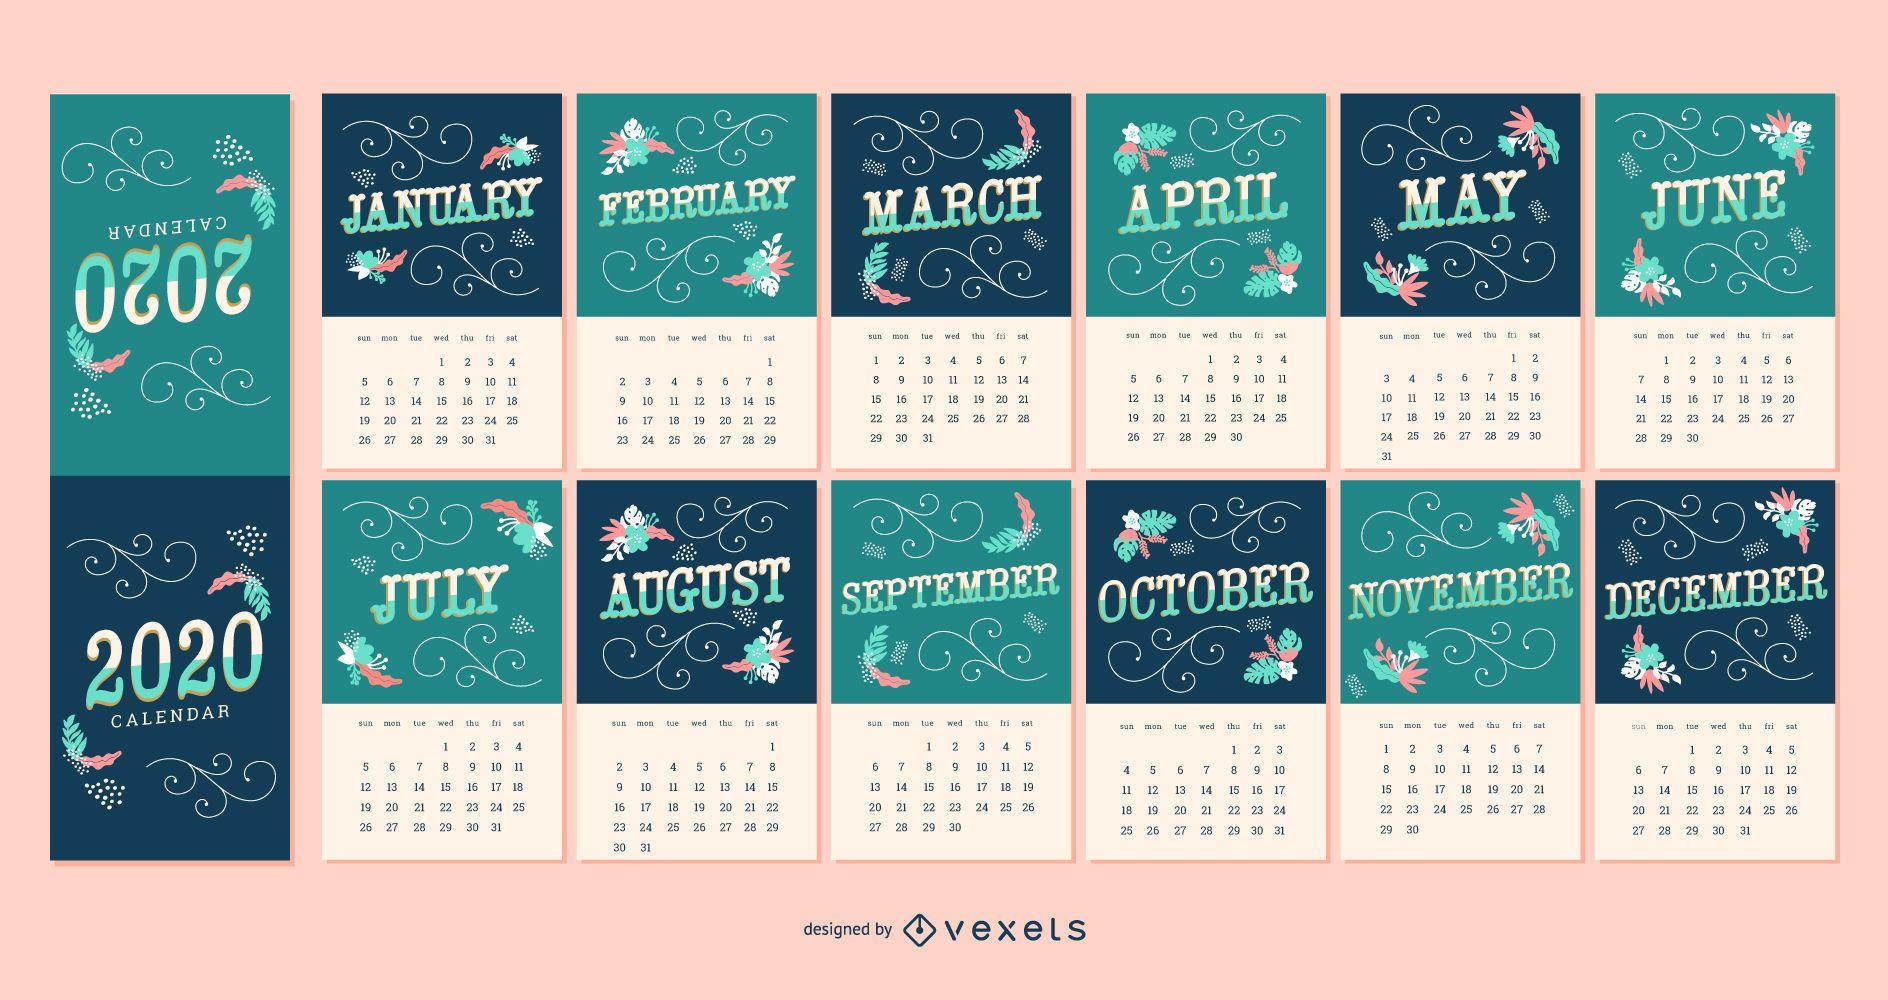 Diseño de calendario de letras 2020